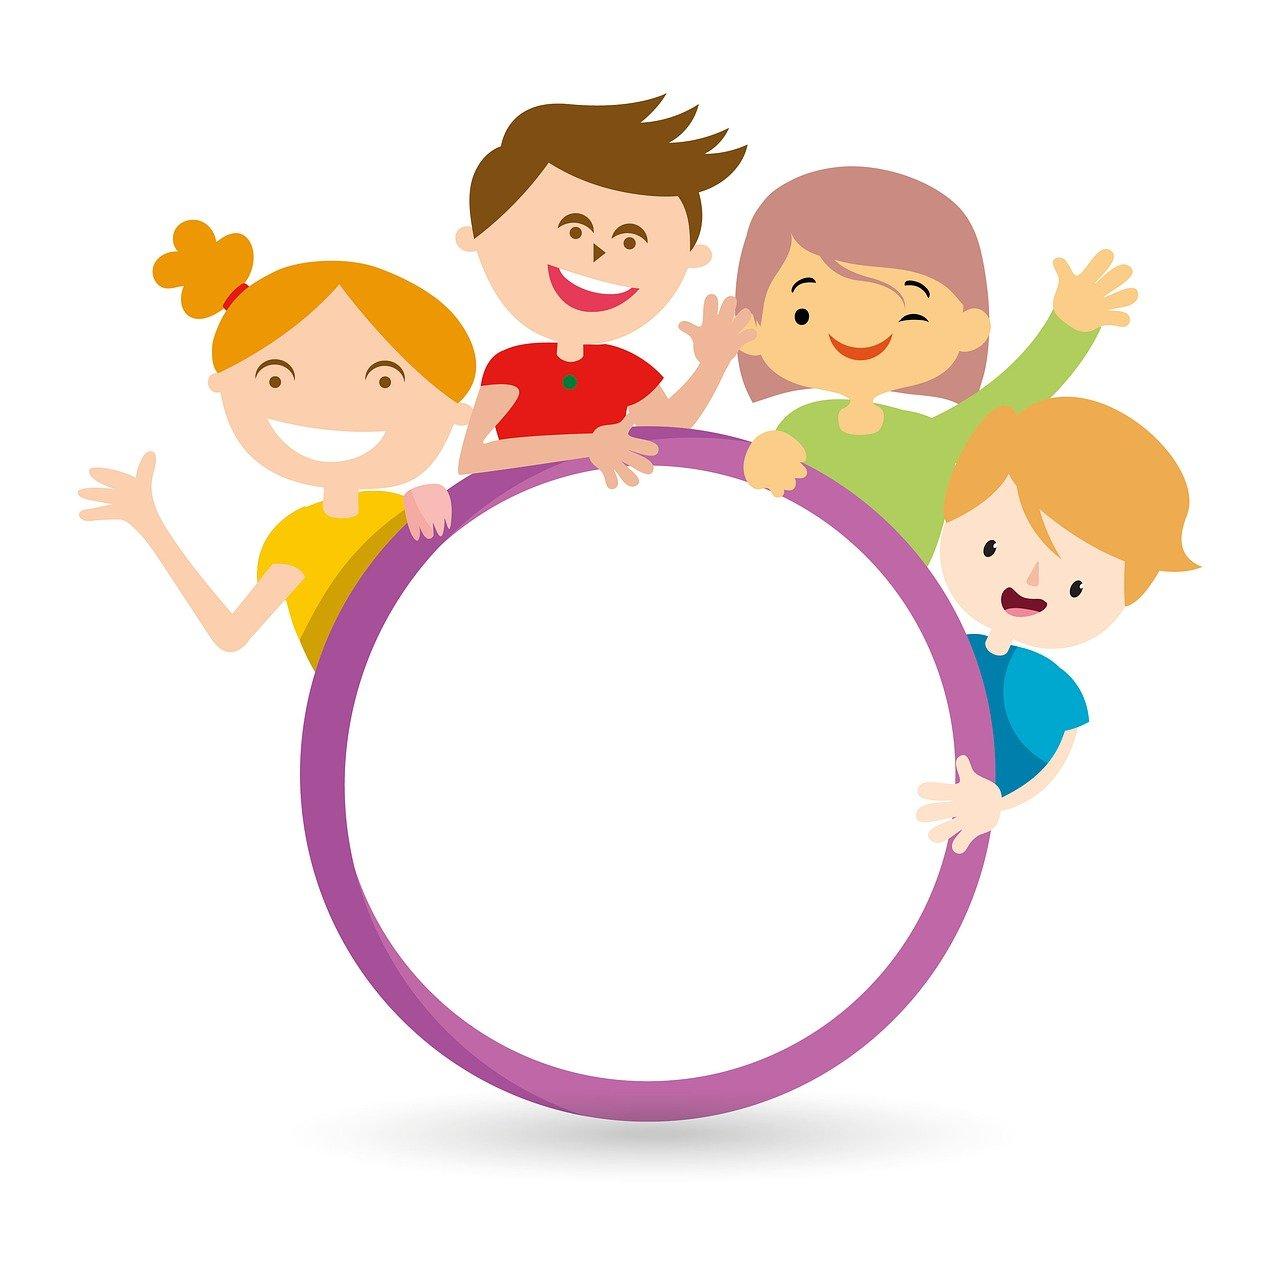 kids, friend, circle